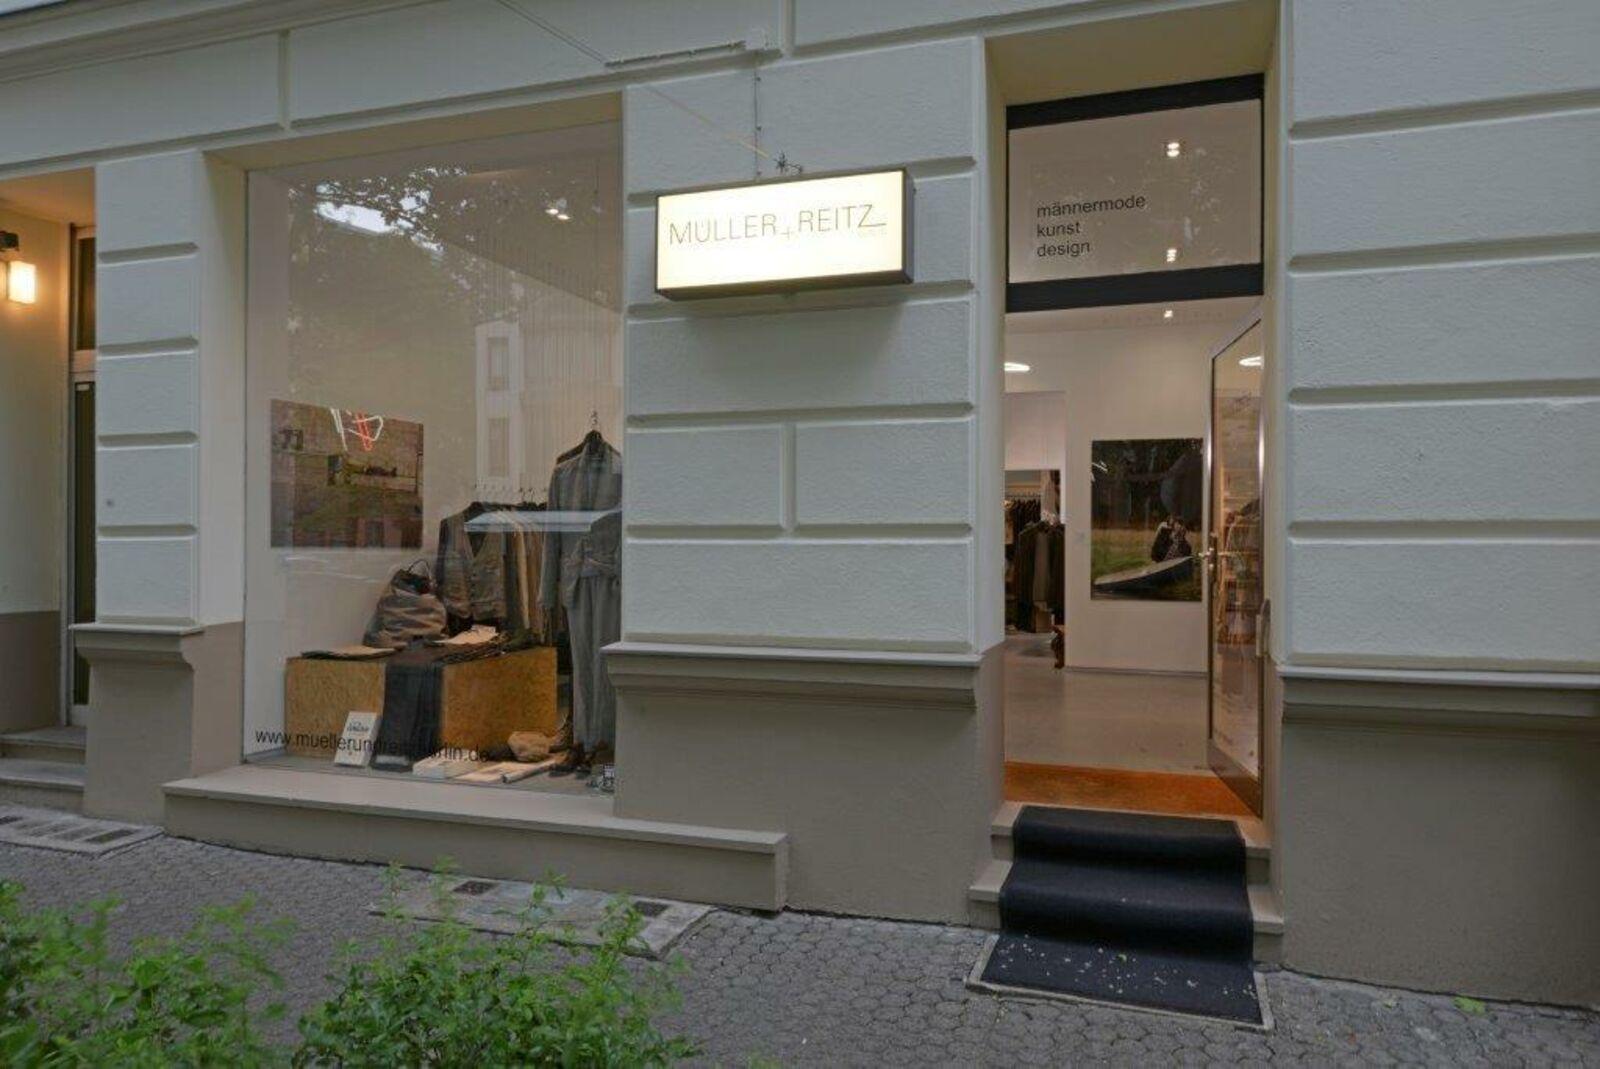 MÜLLER + REITZ in Berlin (Bild 1)